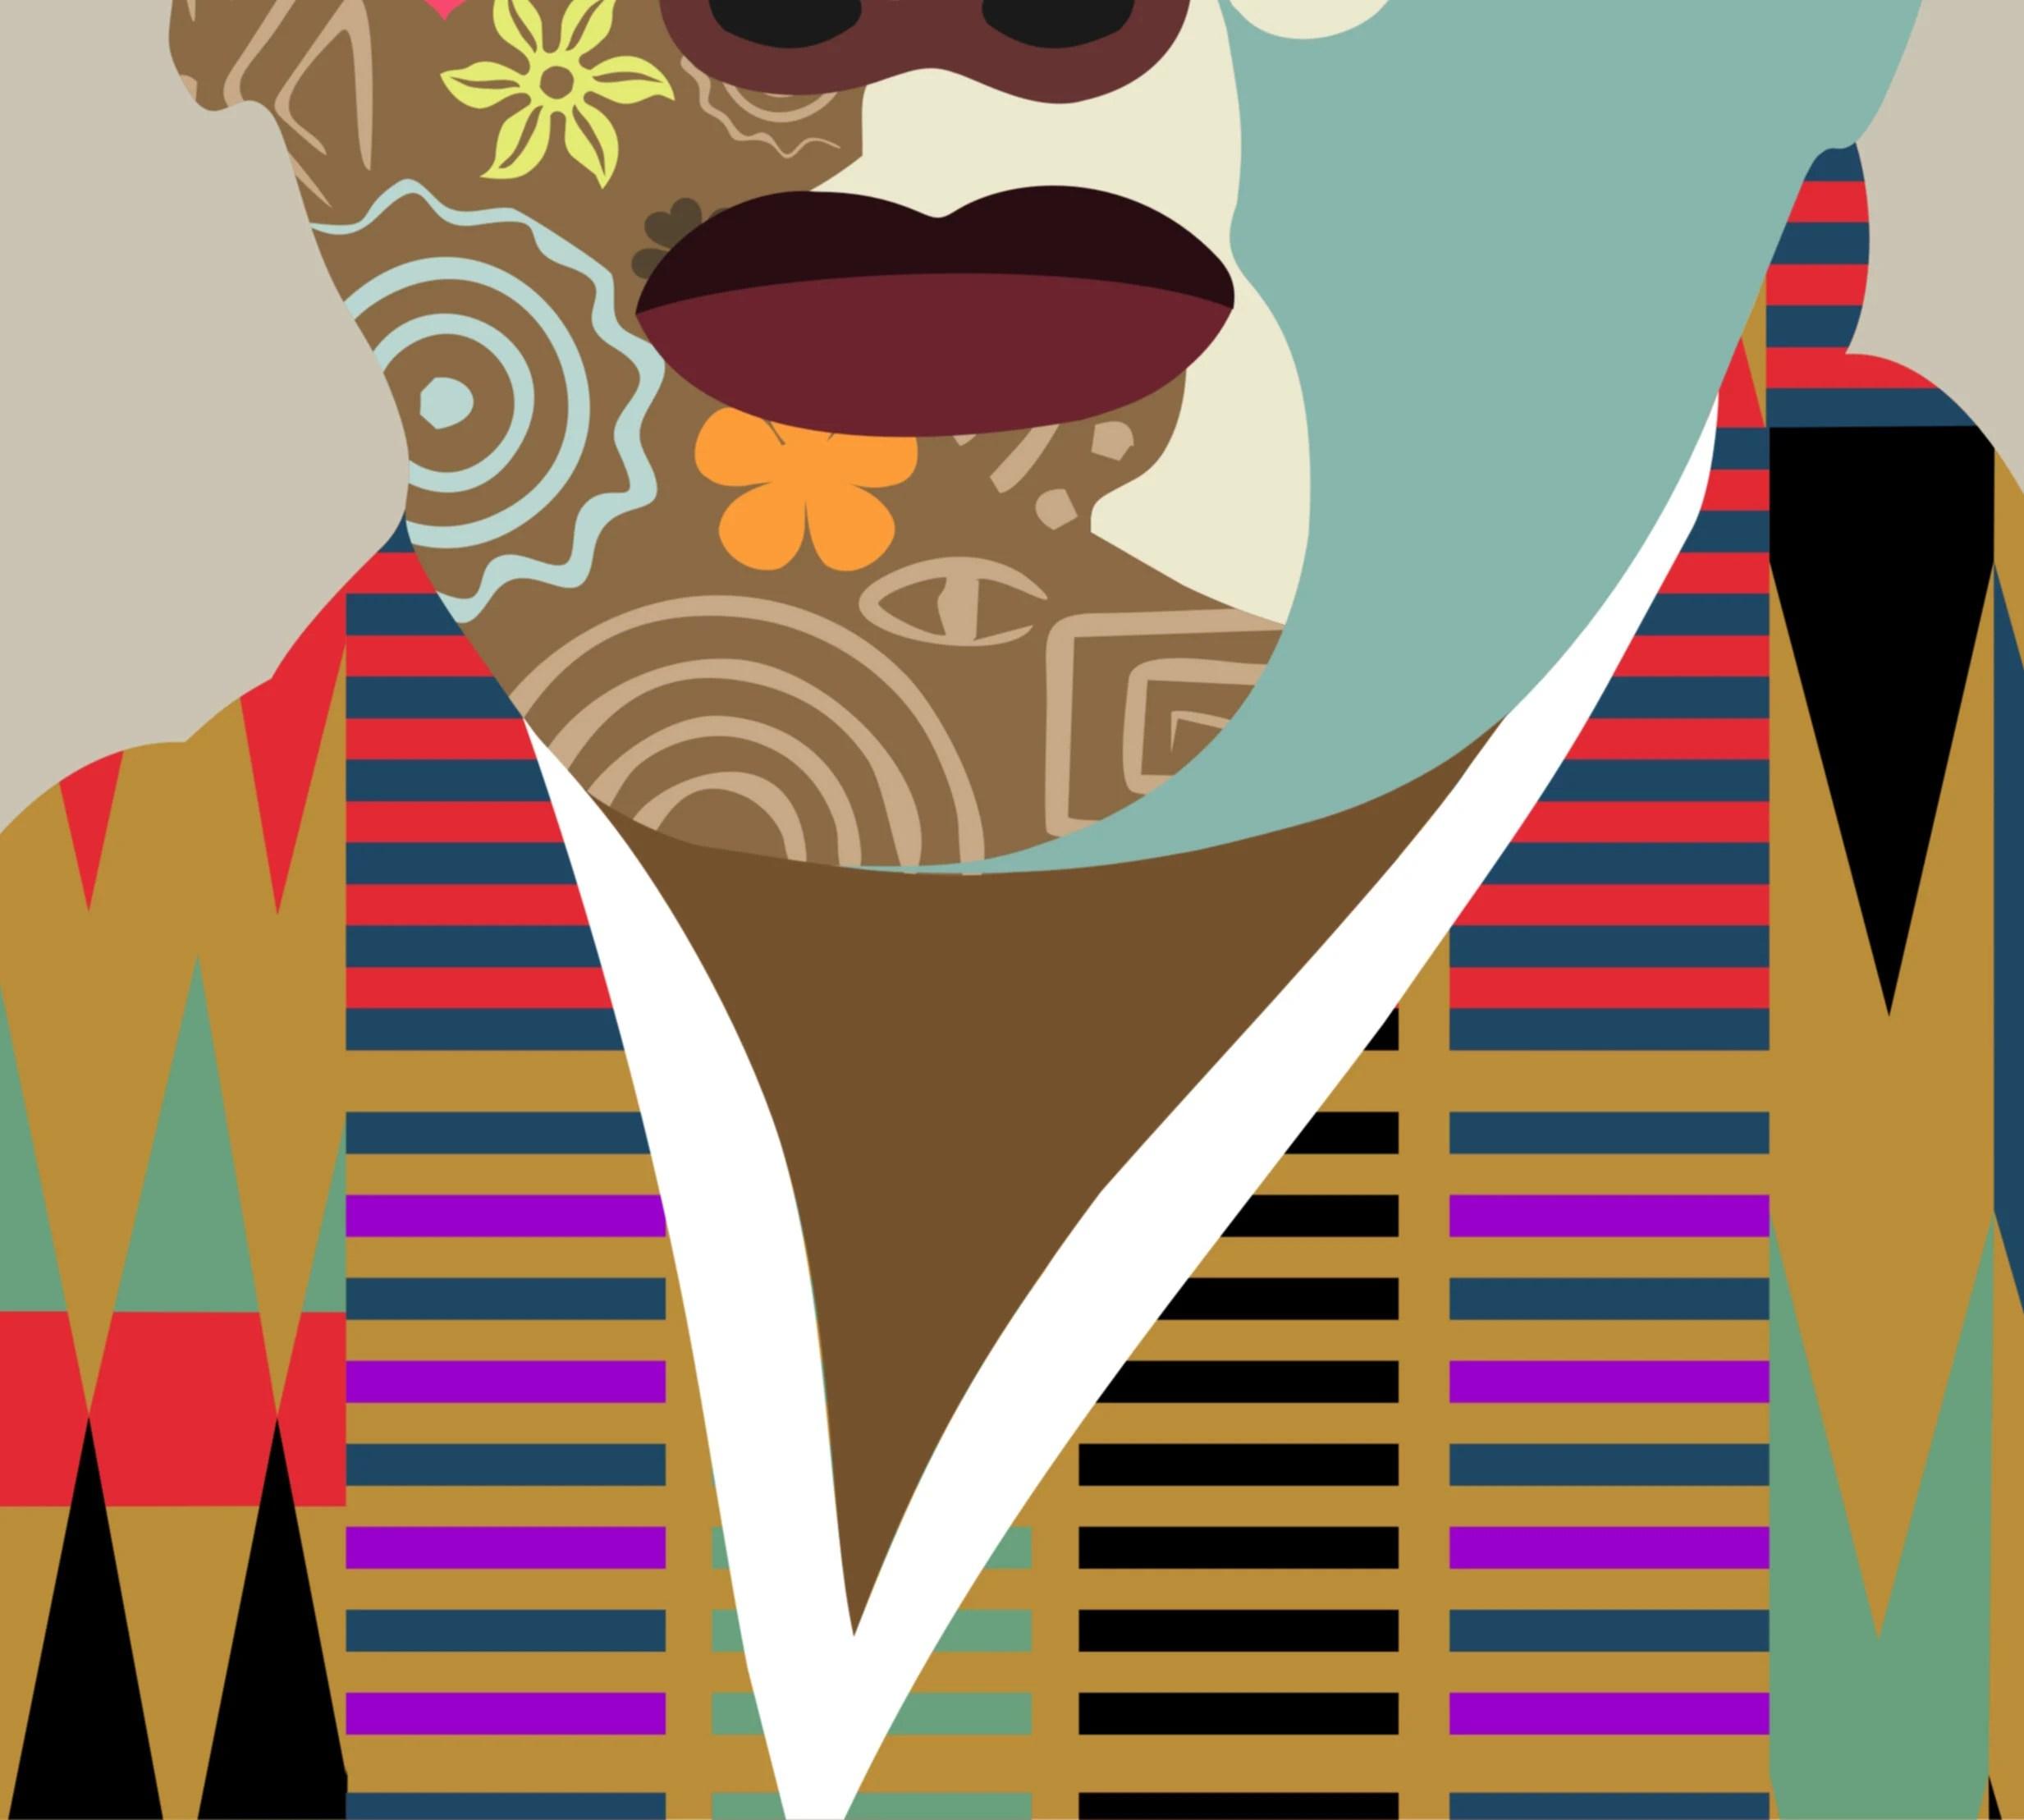 Harriet Tubman Art Civil Rights Black History African